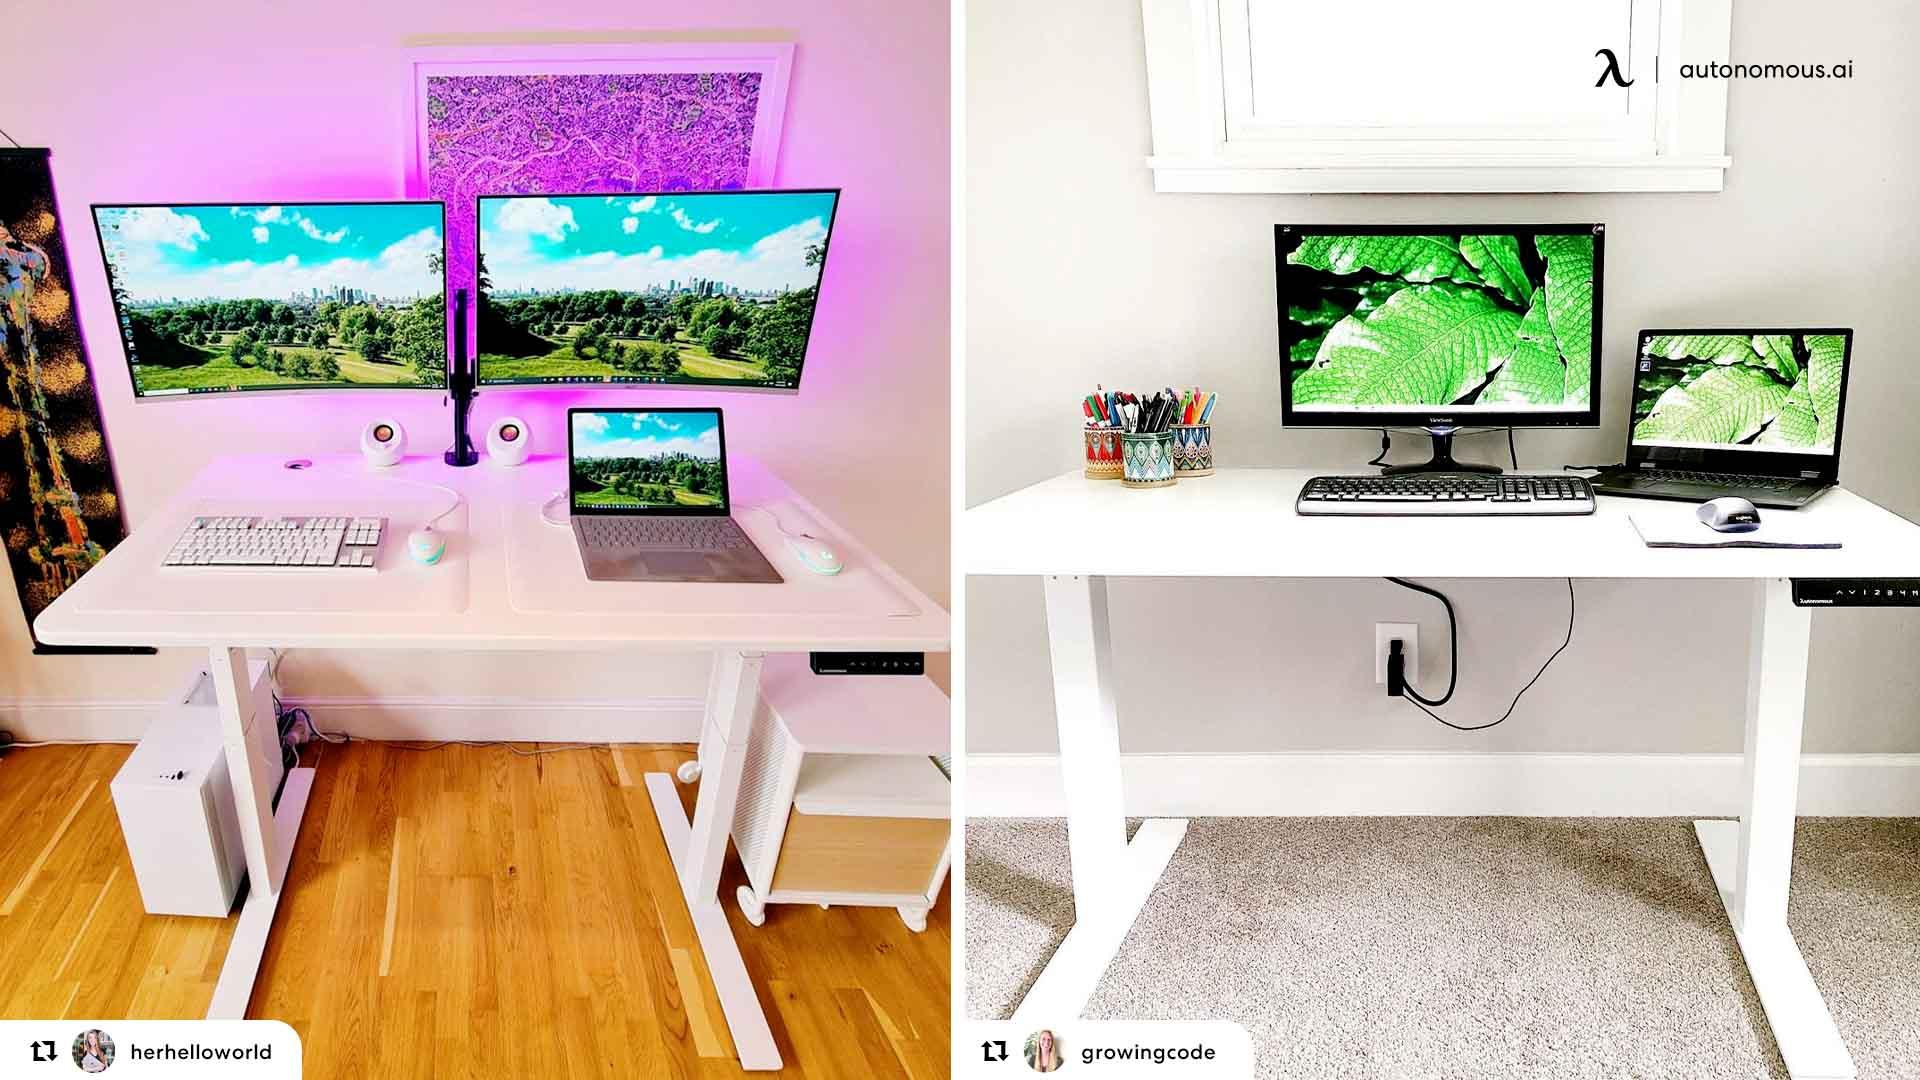 Step 1 – The Desk